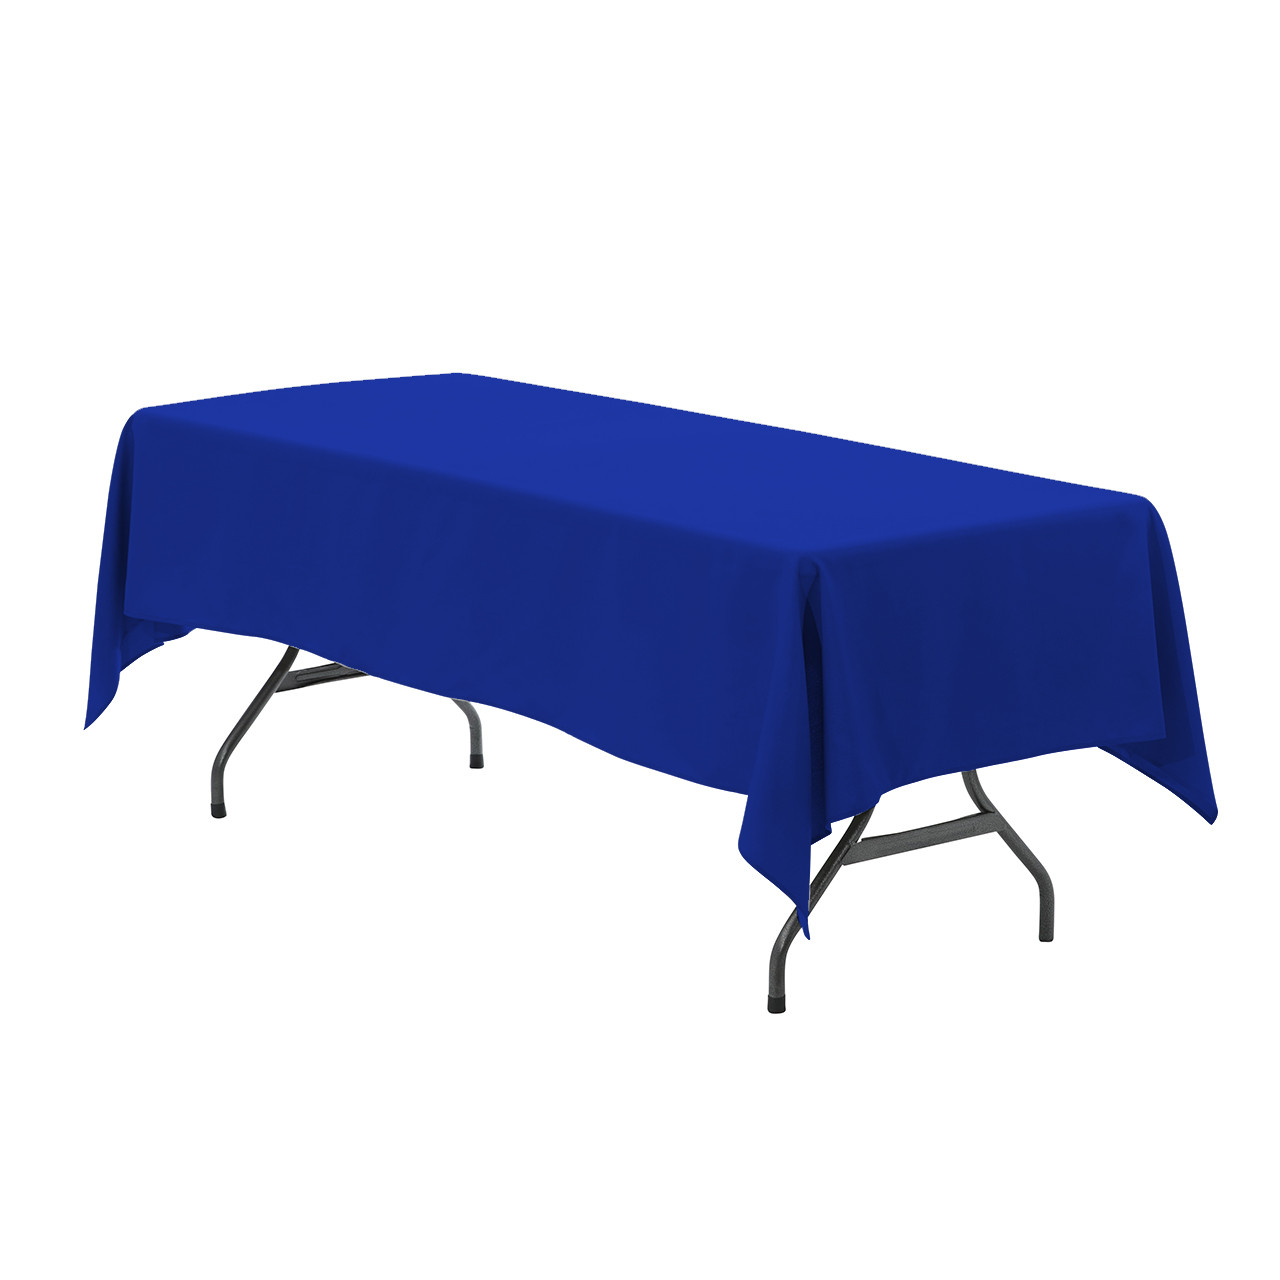 Charmant 60 X 102 Inch Rectangular Polyester Tablecloth Royal Blue ...